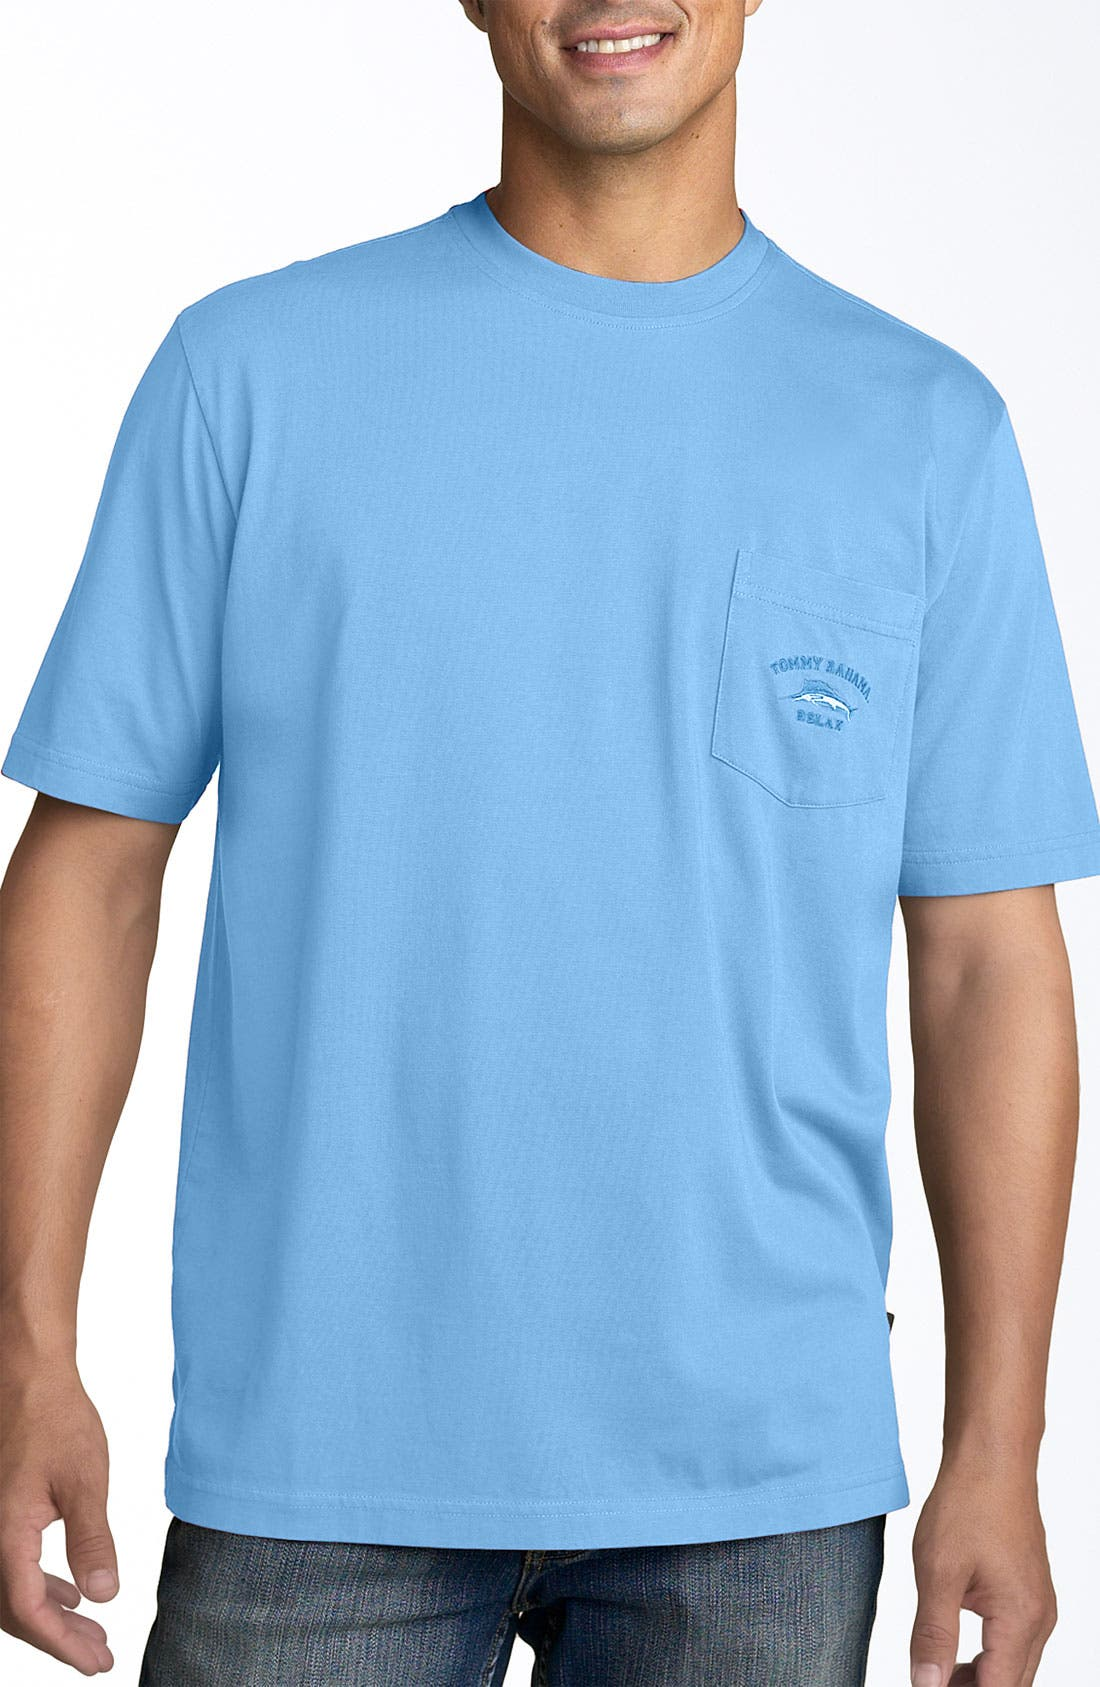 Main Image - Tommy Bahama Relax 'Bali High Tide' Regular Fit T-Shirt